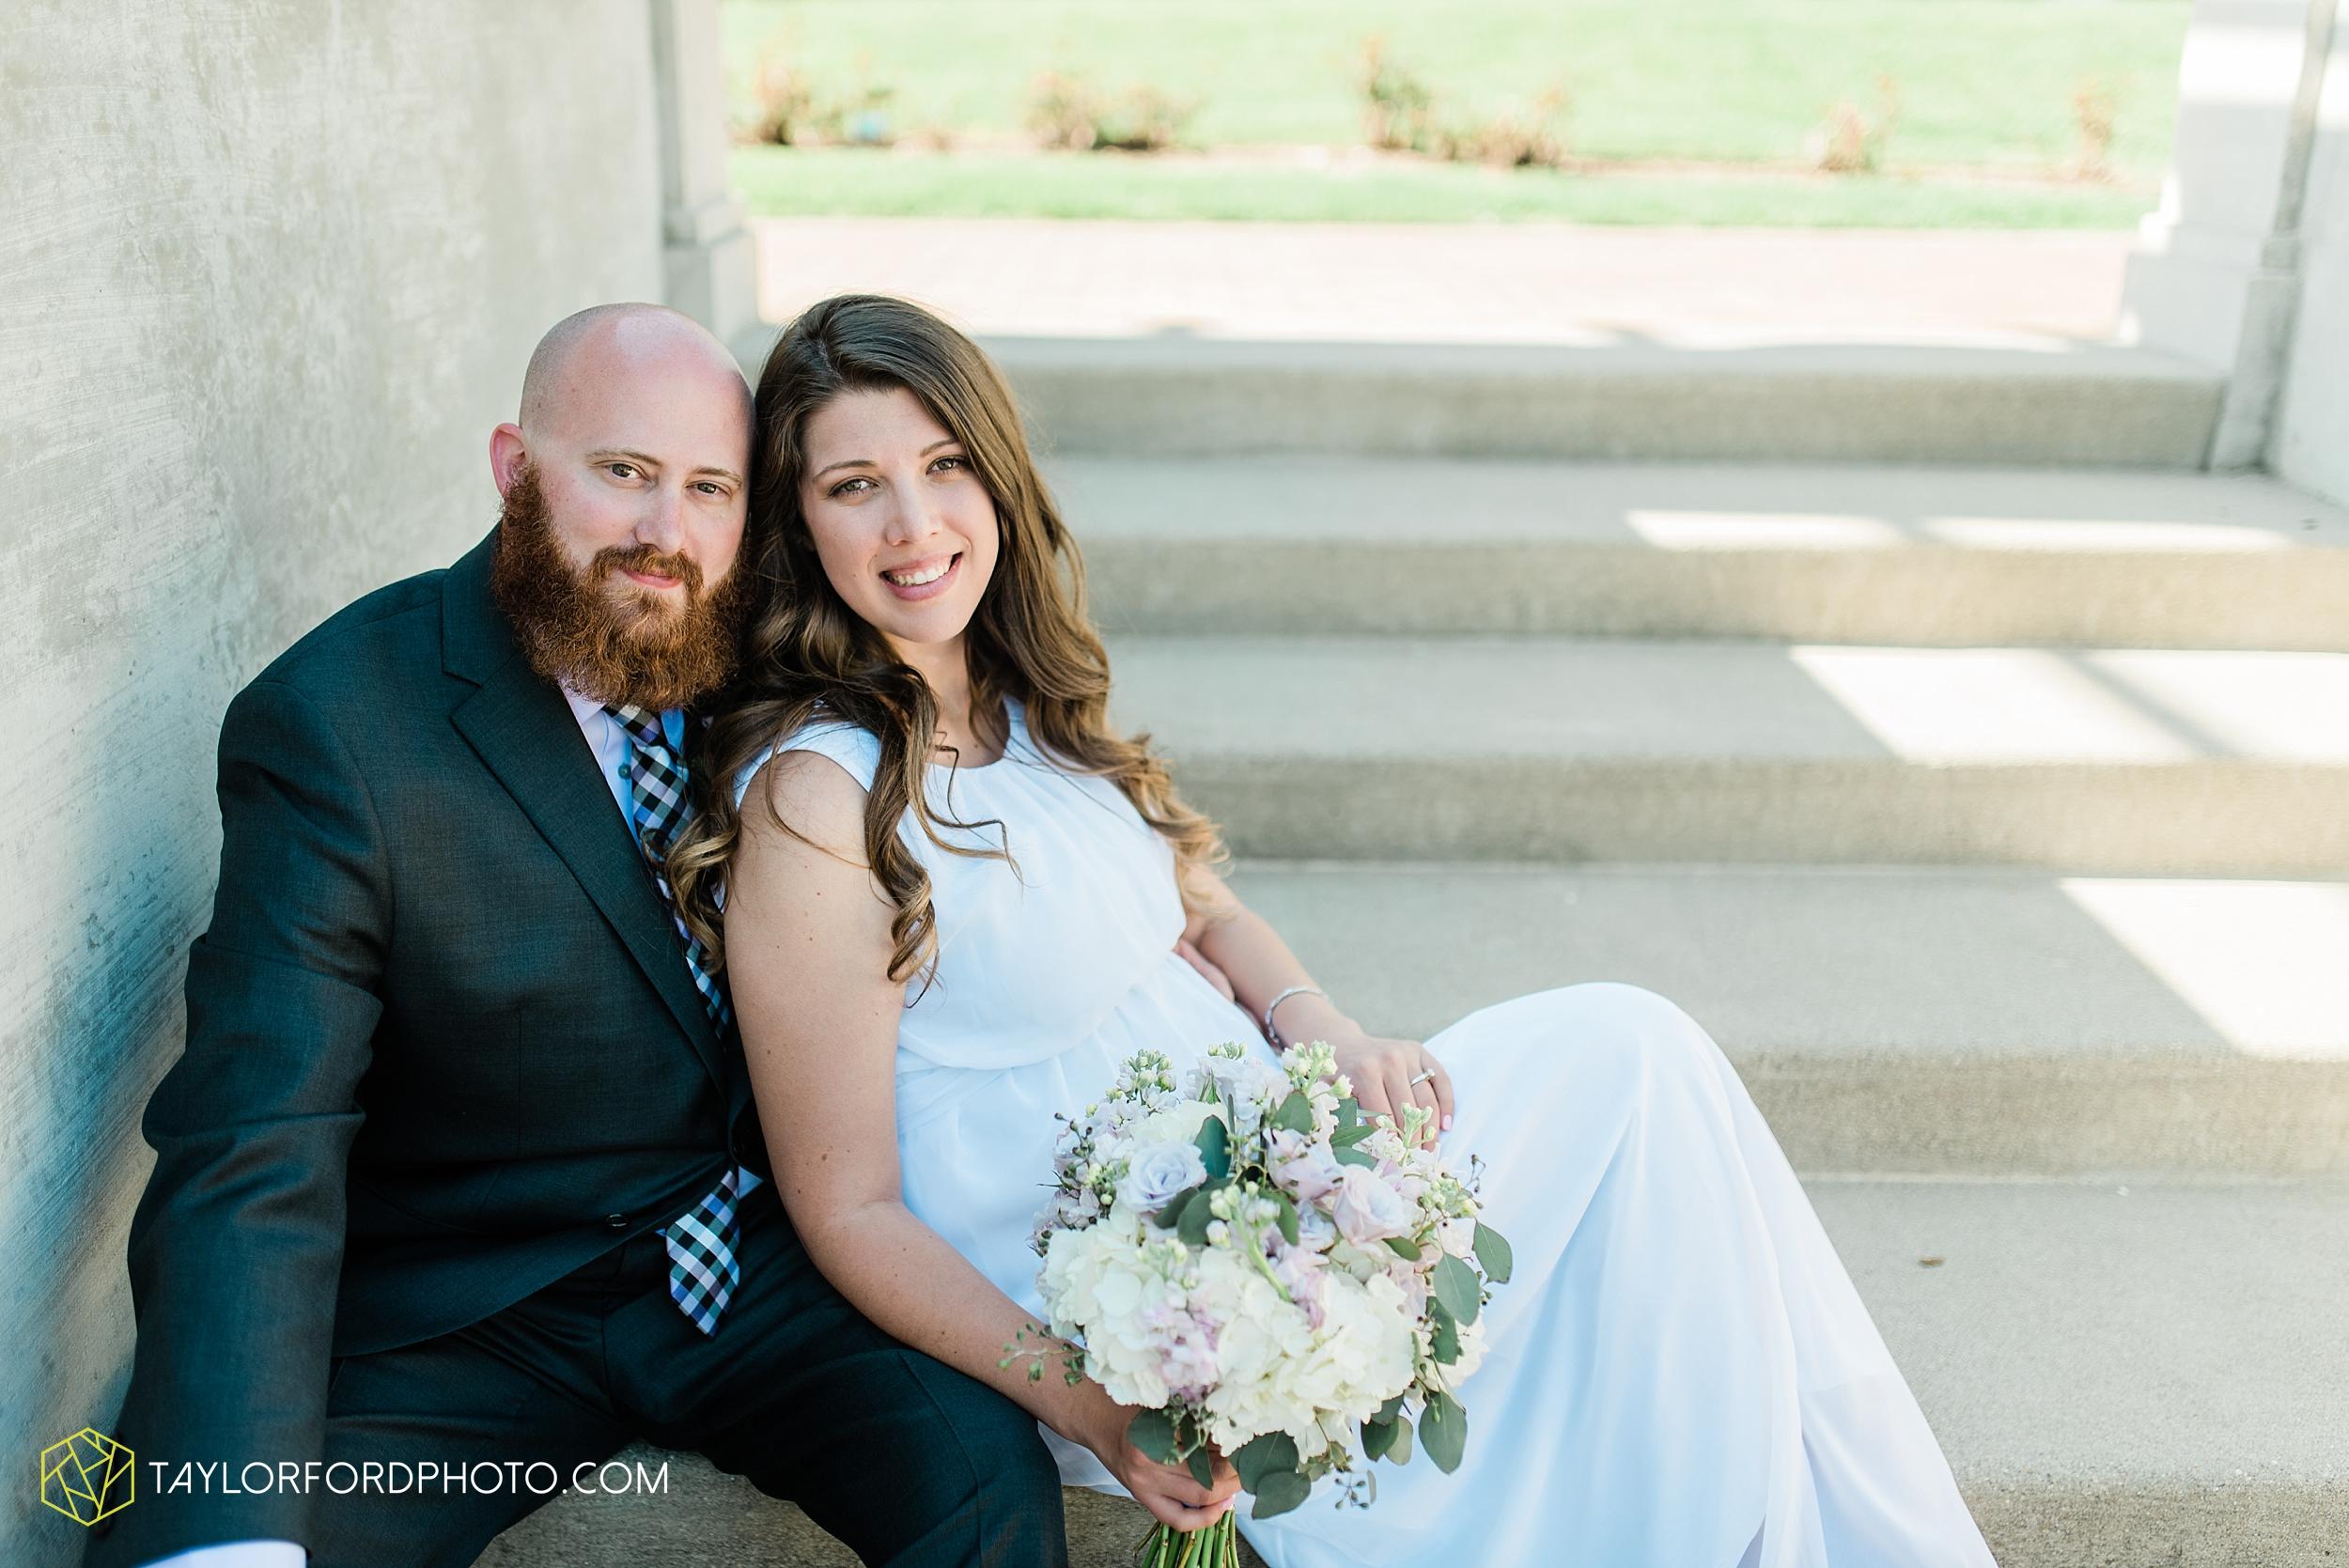 lakeside-rose-gardens-fort-wayne-indiana-elopement-wedding-photographer-Taylor-Ford-Photography_7171.jpg